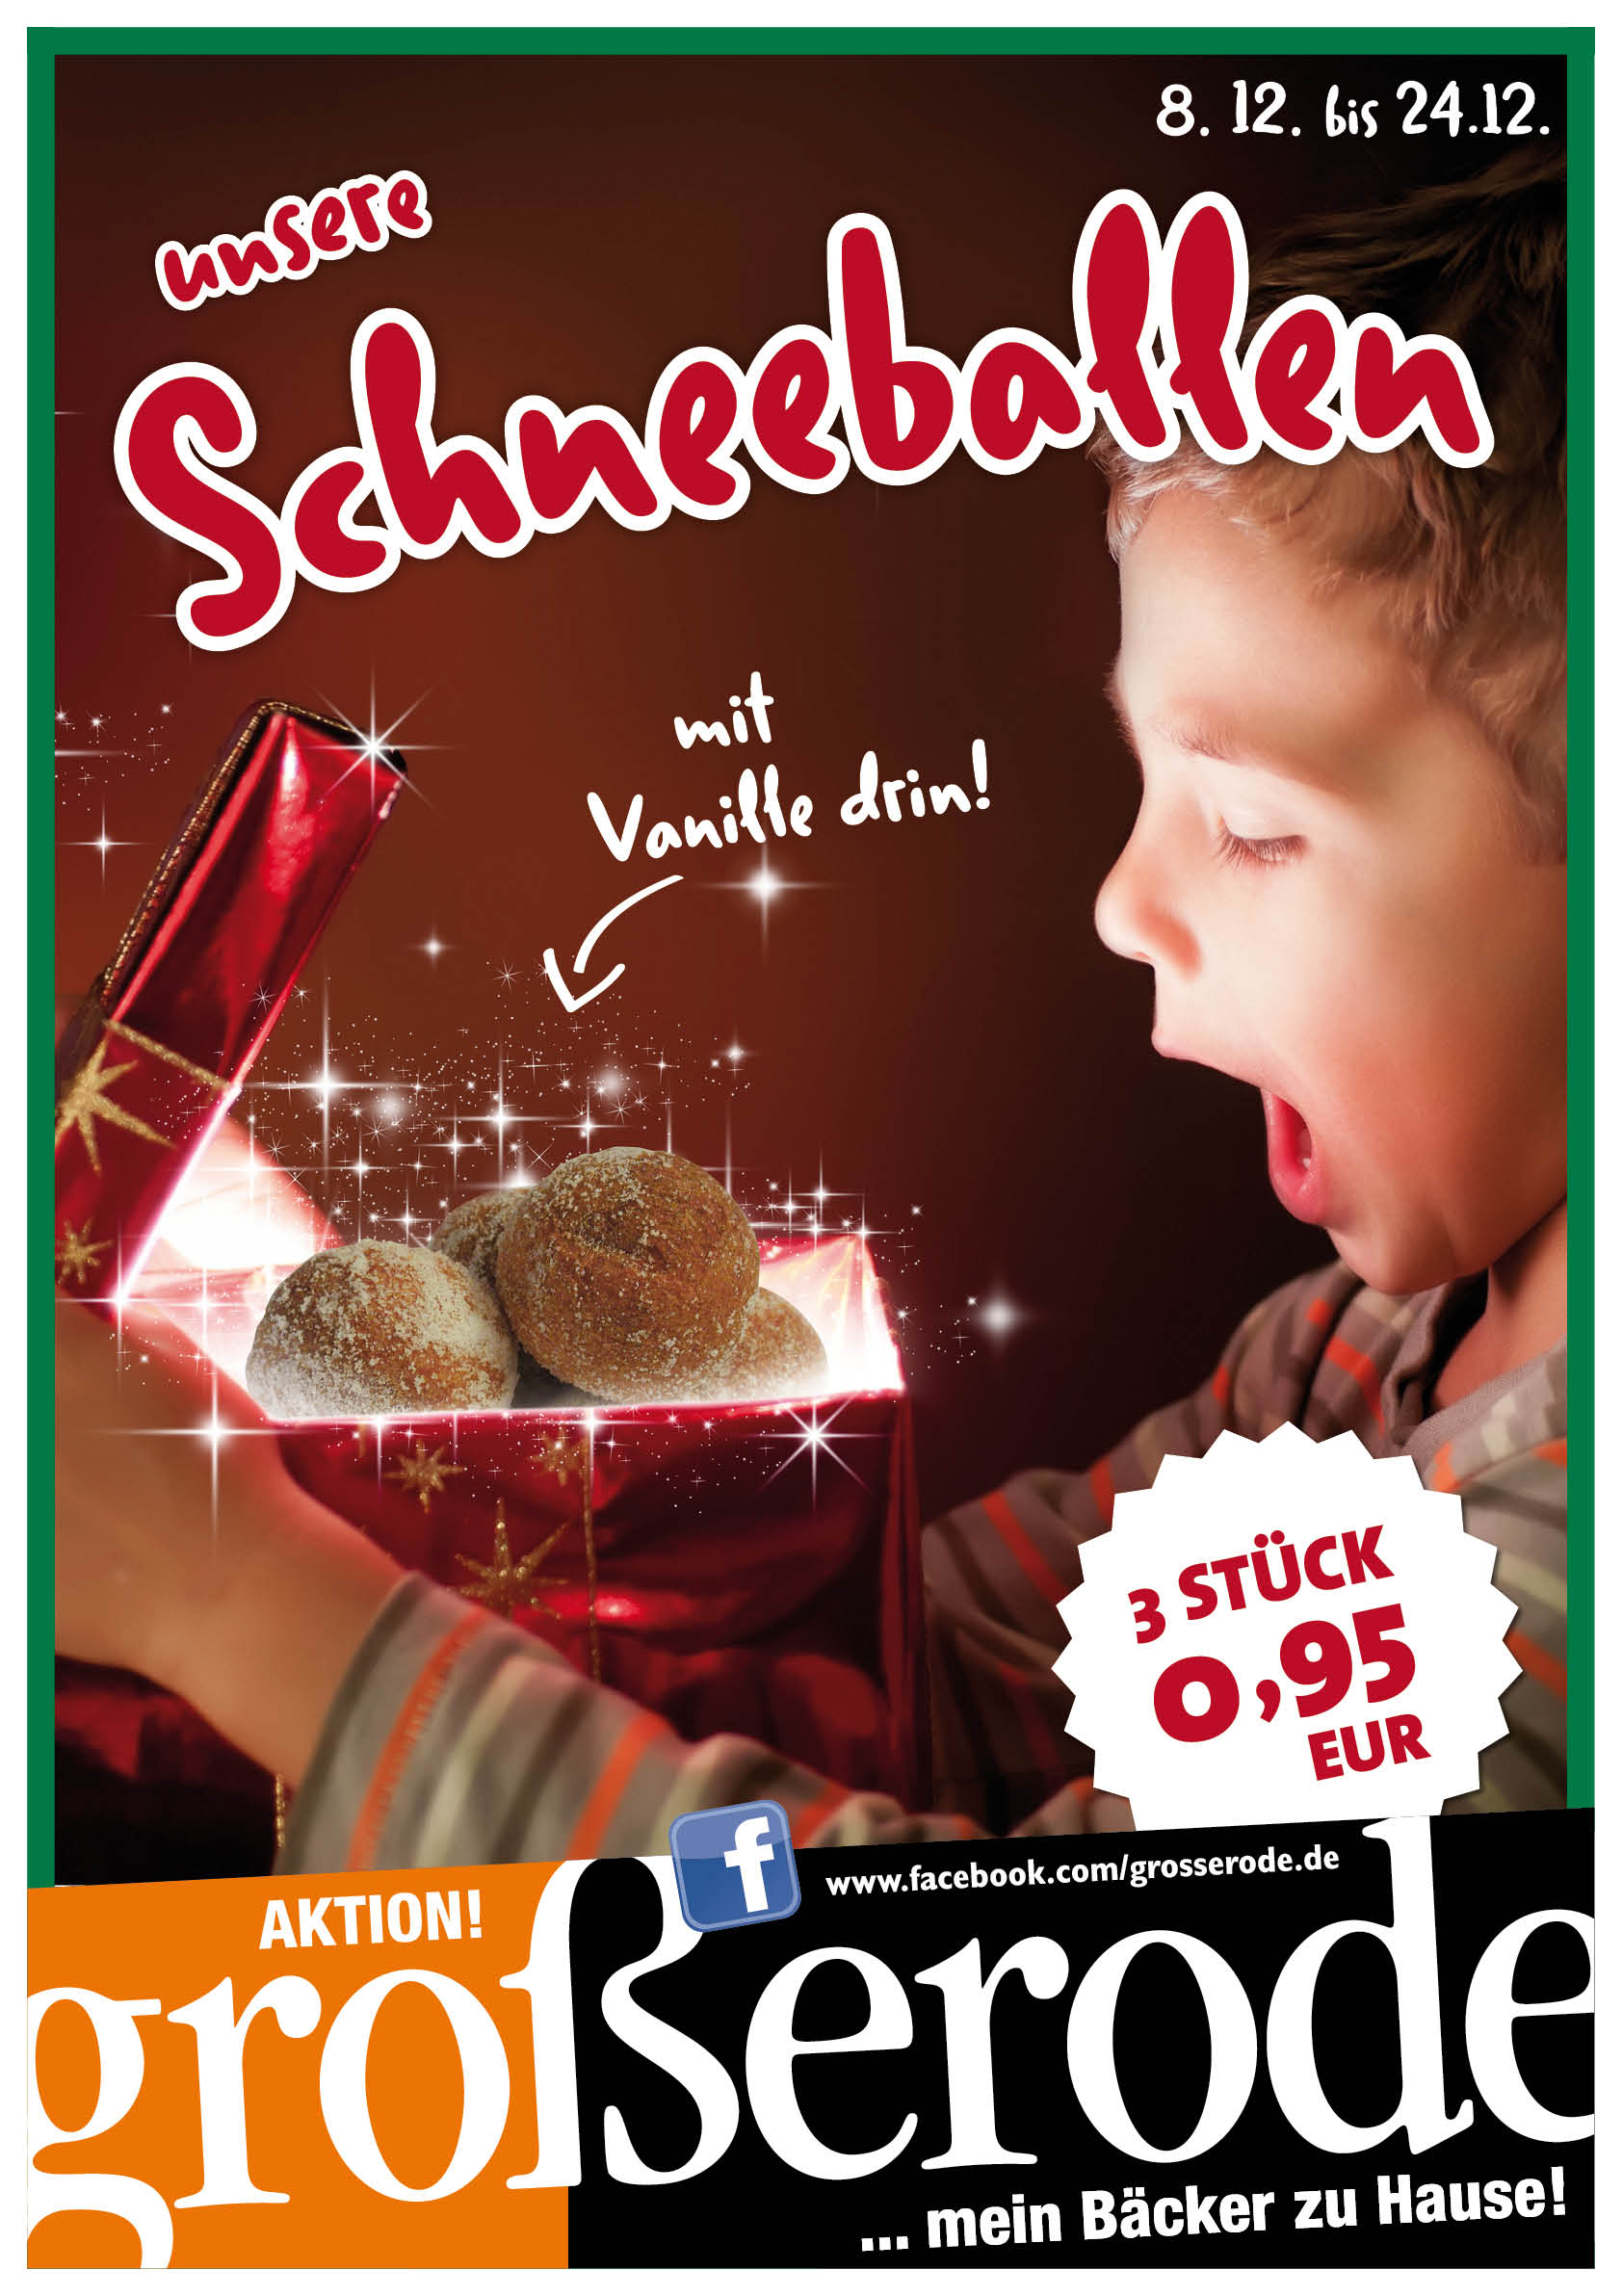 20141125_Grosserode_Weihnachten_Schneeball_Web.jpg